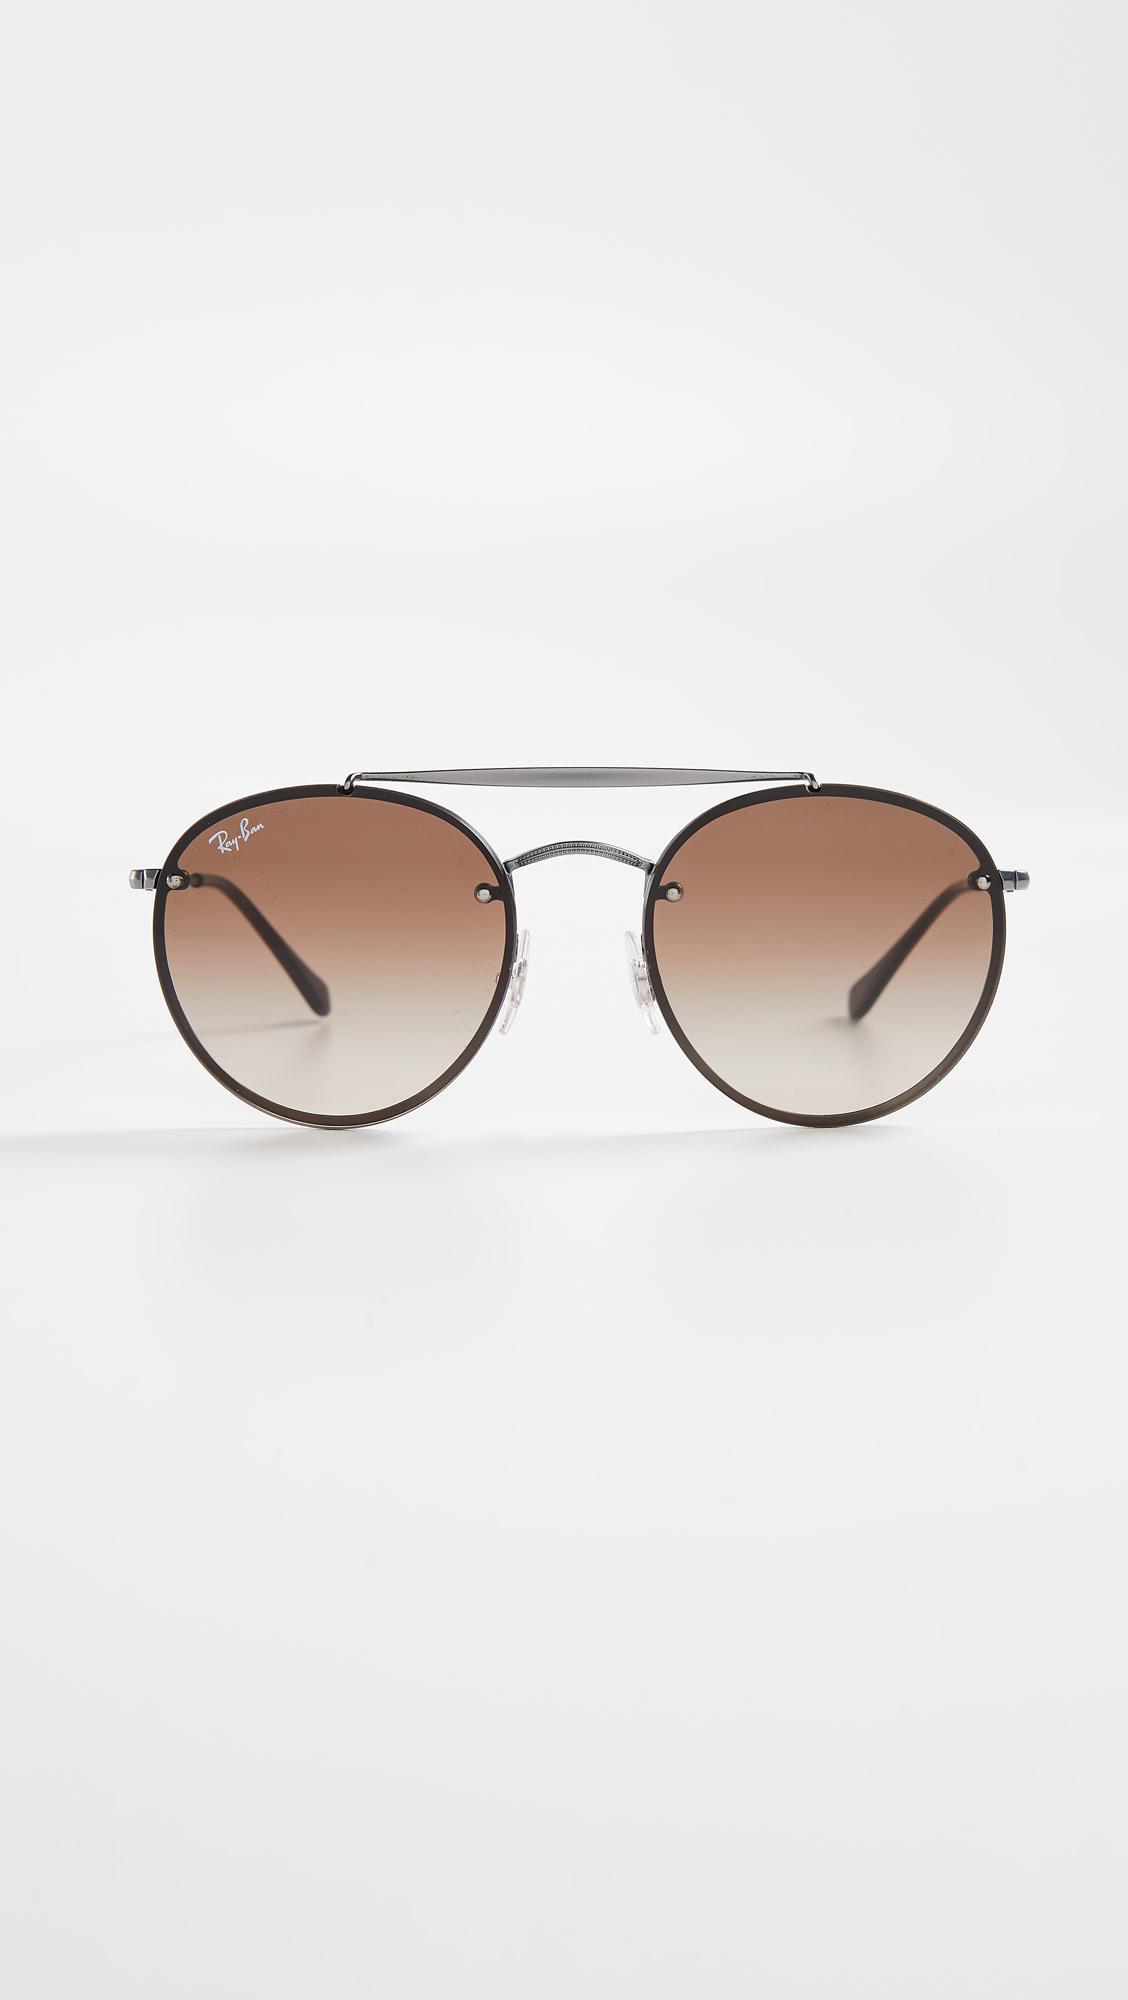 82081f33c6 Ray-Ban. Women s Rb3614n Blaze Rimless Round Aviator Sunglasses